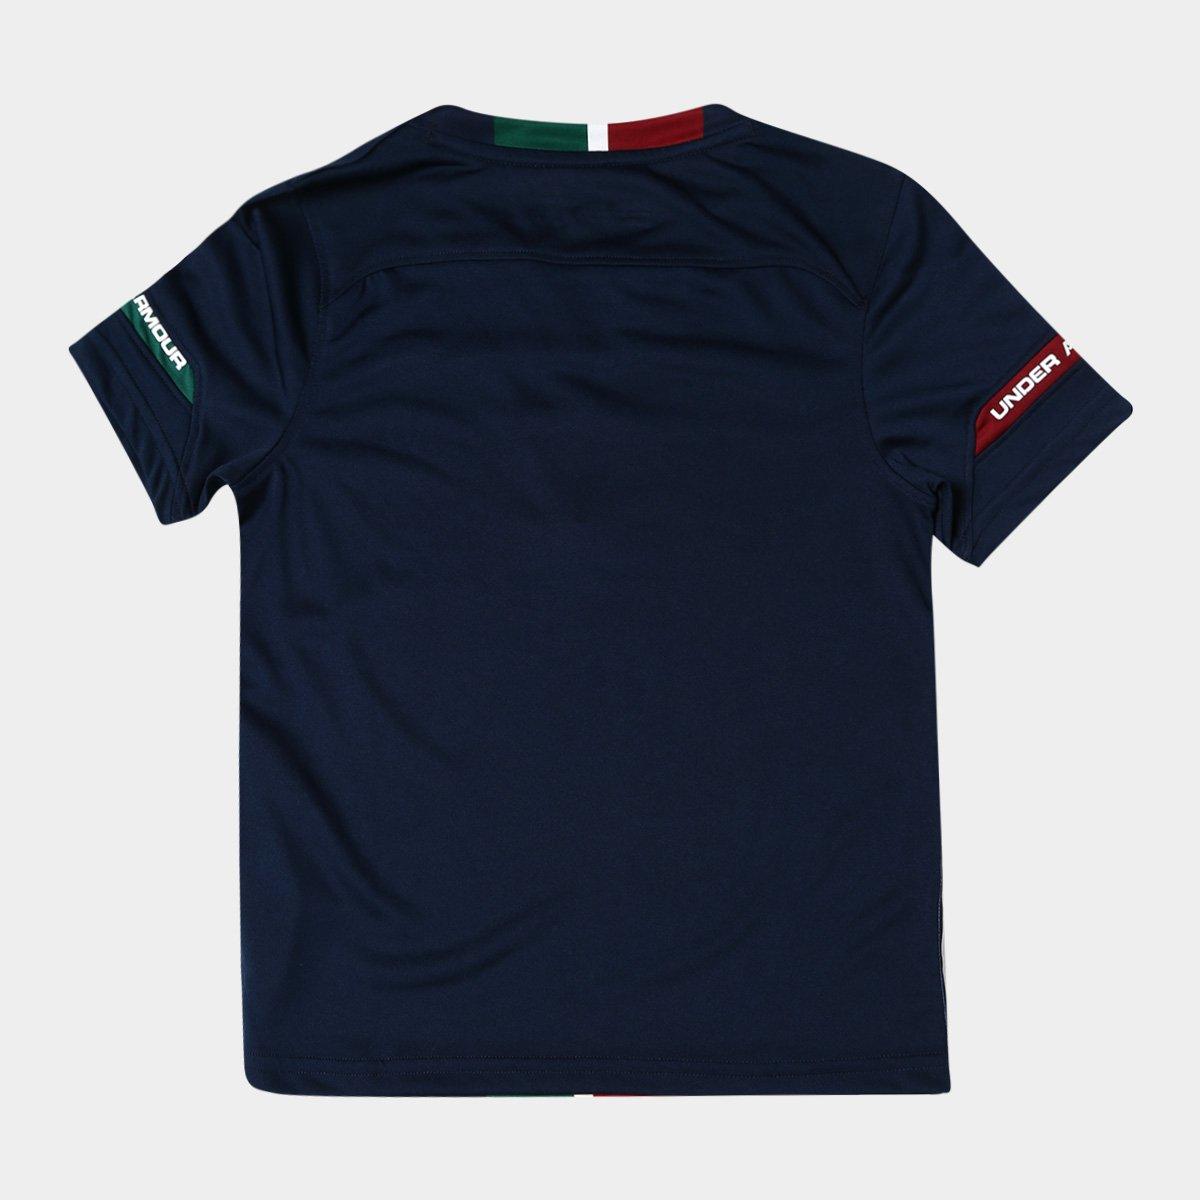 Camisa Fluminense Infantil III 19 20 s n° - Torcedor Under Armour ... 136a520e477ae